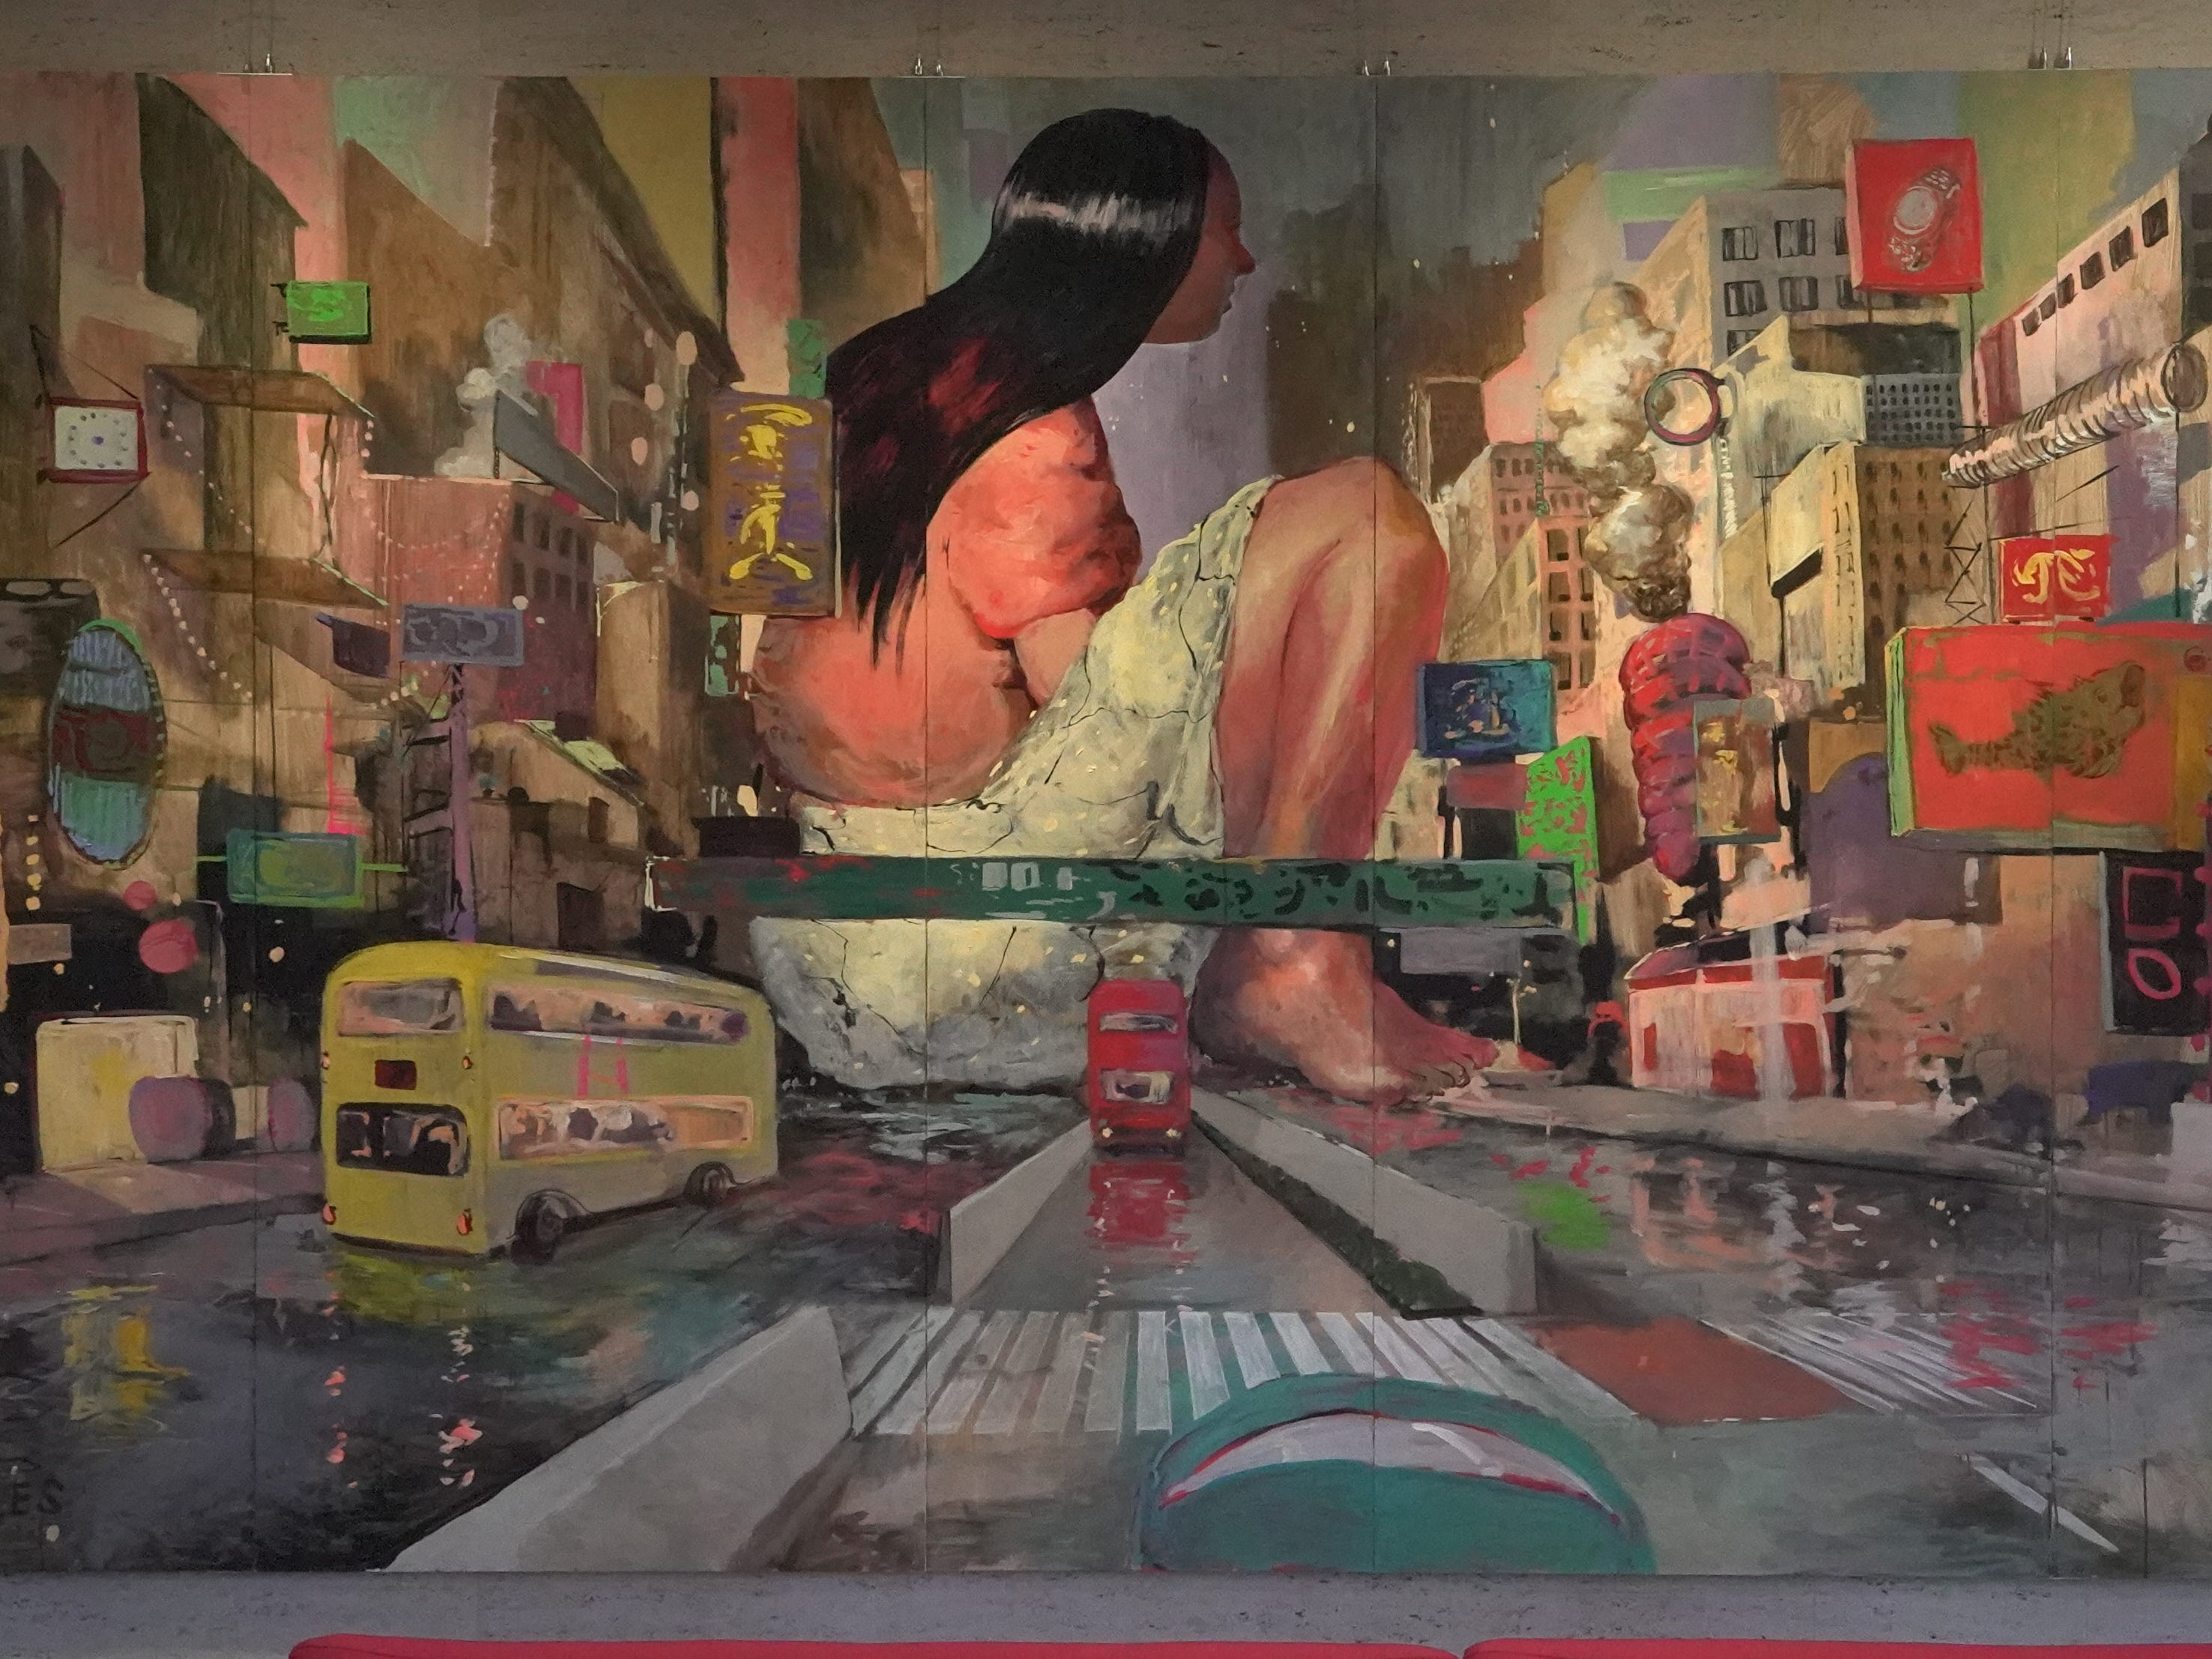 Artwork of a Hong Kong street scene inside the Savannah College of Art and Design.